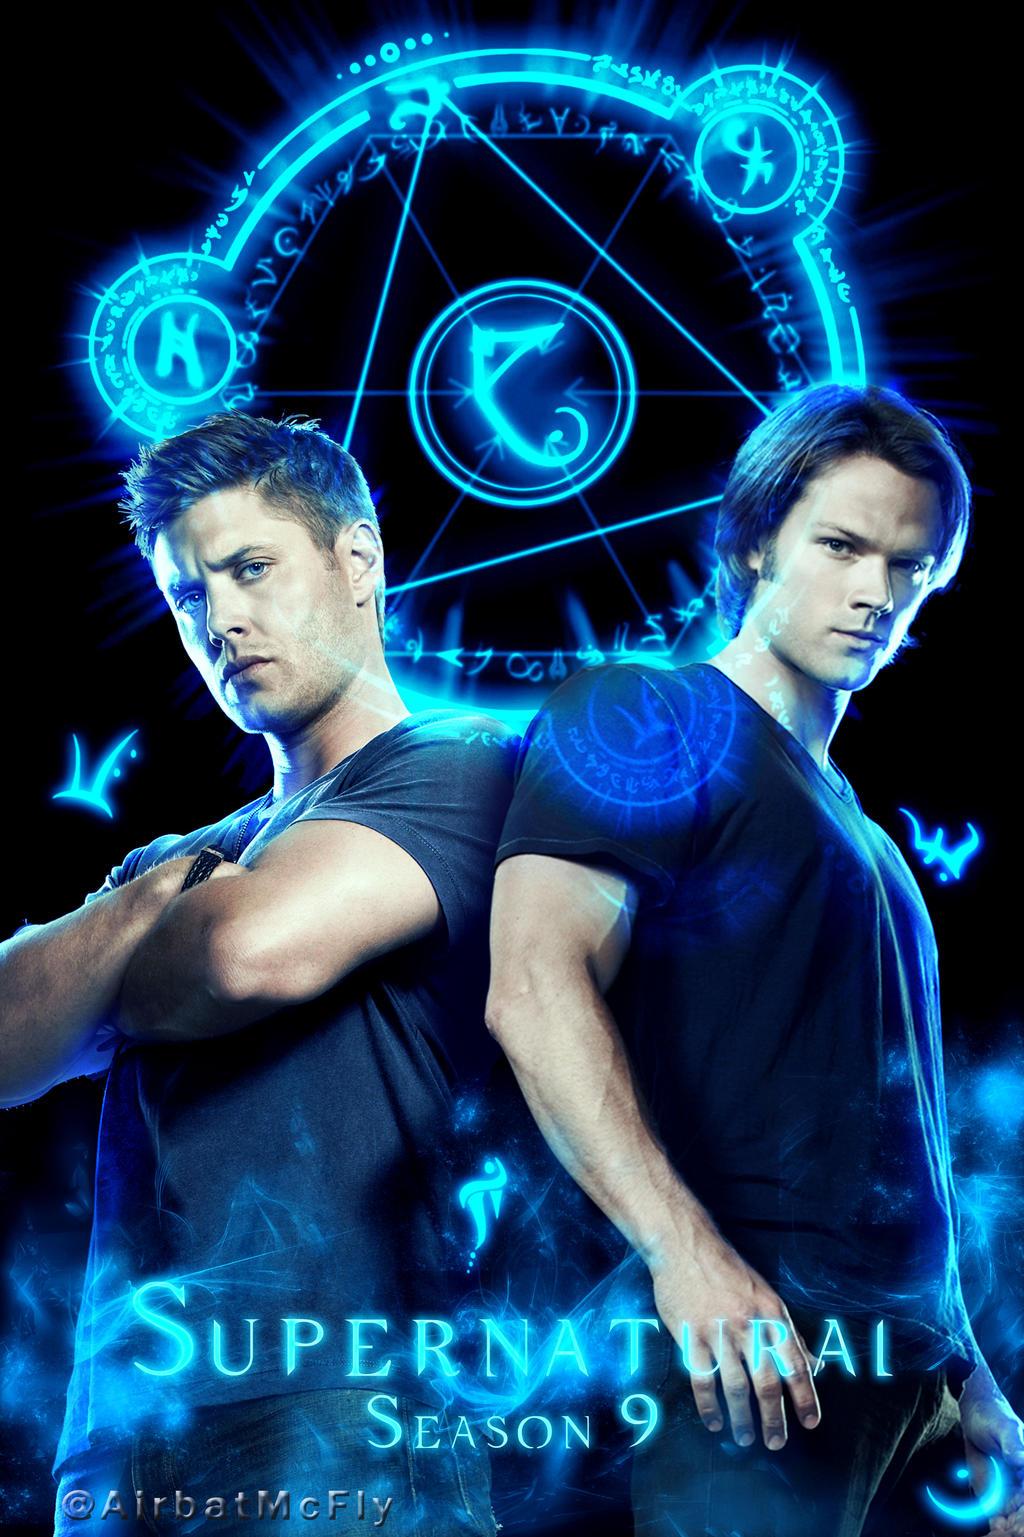 Supernatural - Season 9 by AirbatMcFly on DeviantArt